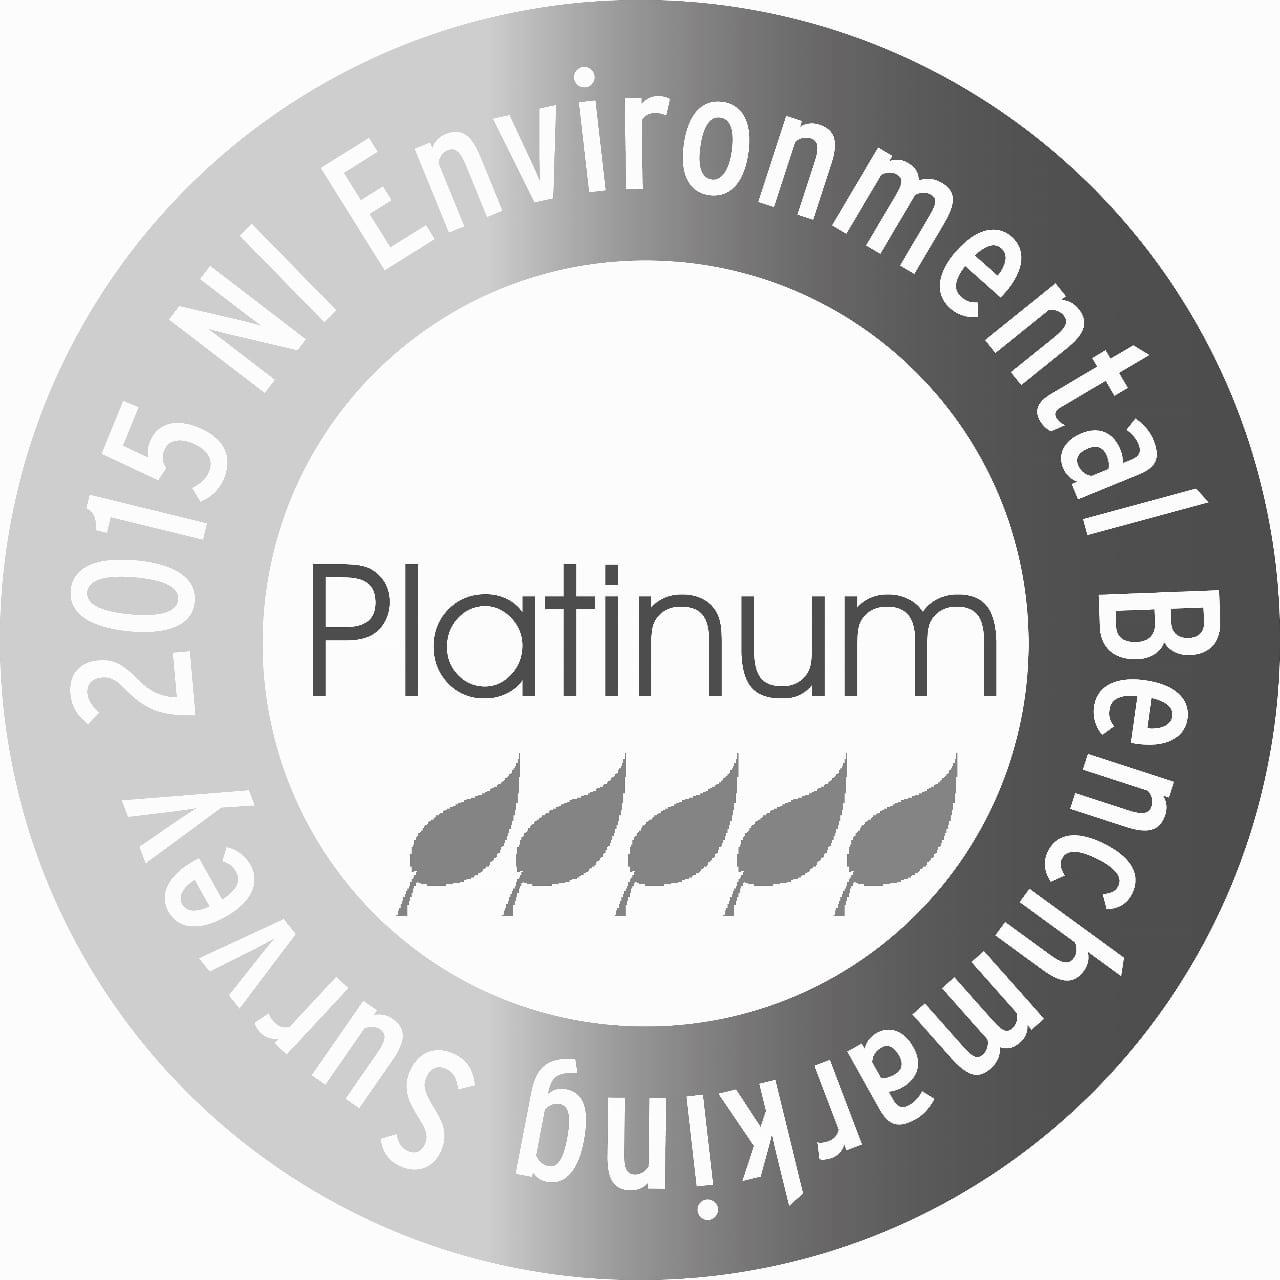 ARENA Network Environmental Benchmarking Survey 2015 – Platinum